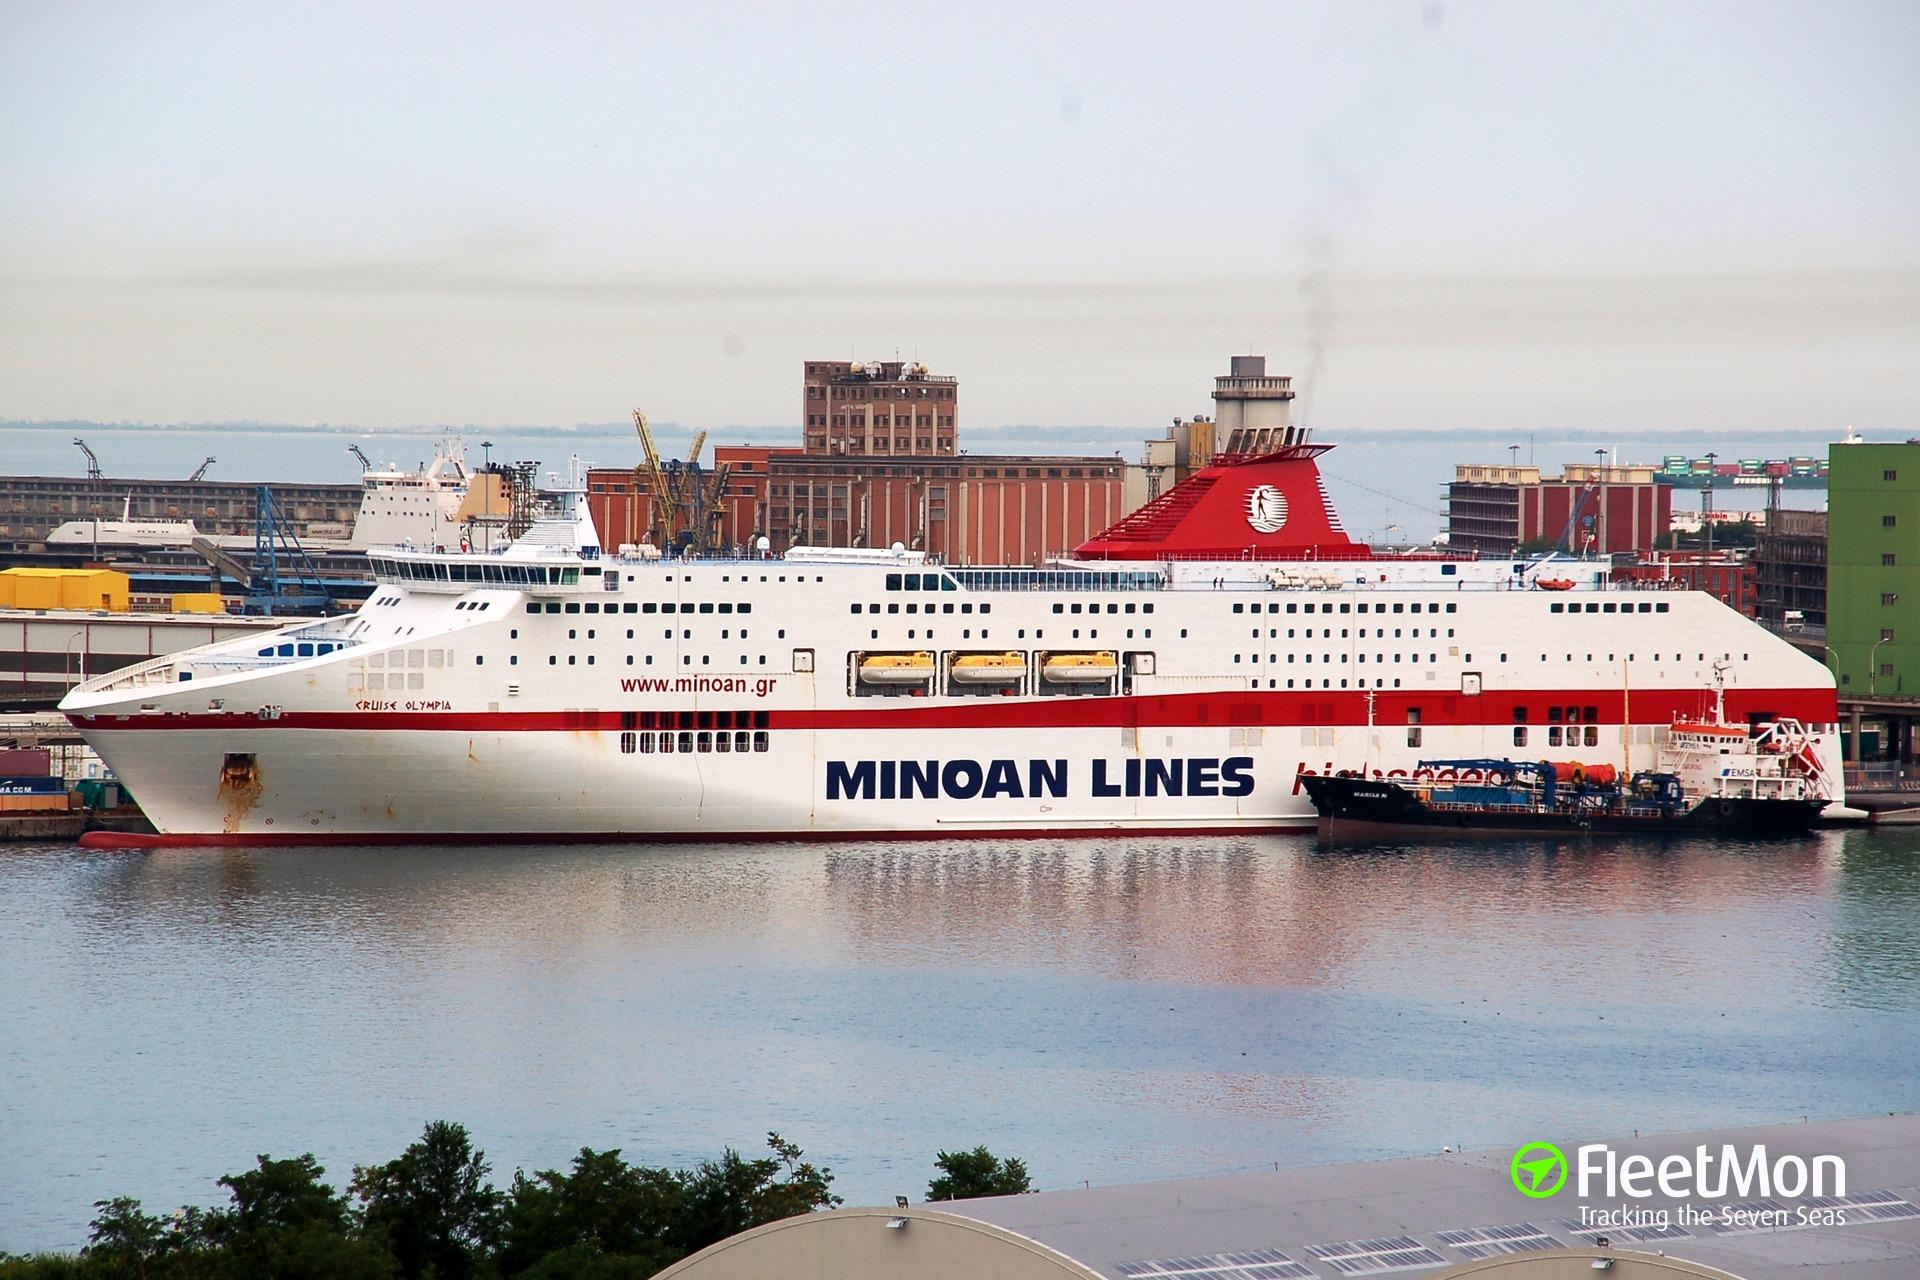 Italian cruise ship CRUISE OLYMPIA contacted Greek ferry, damaged